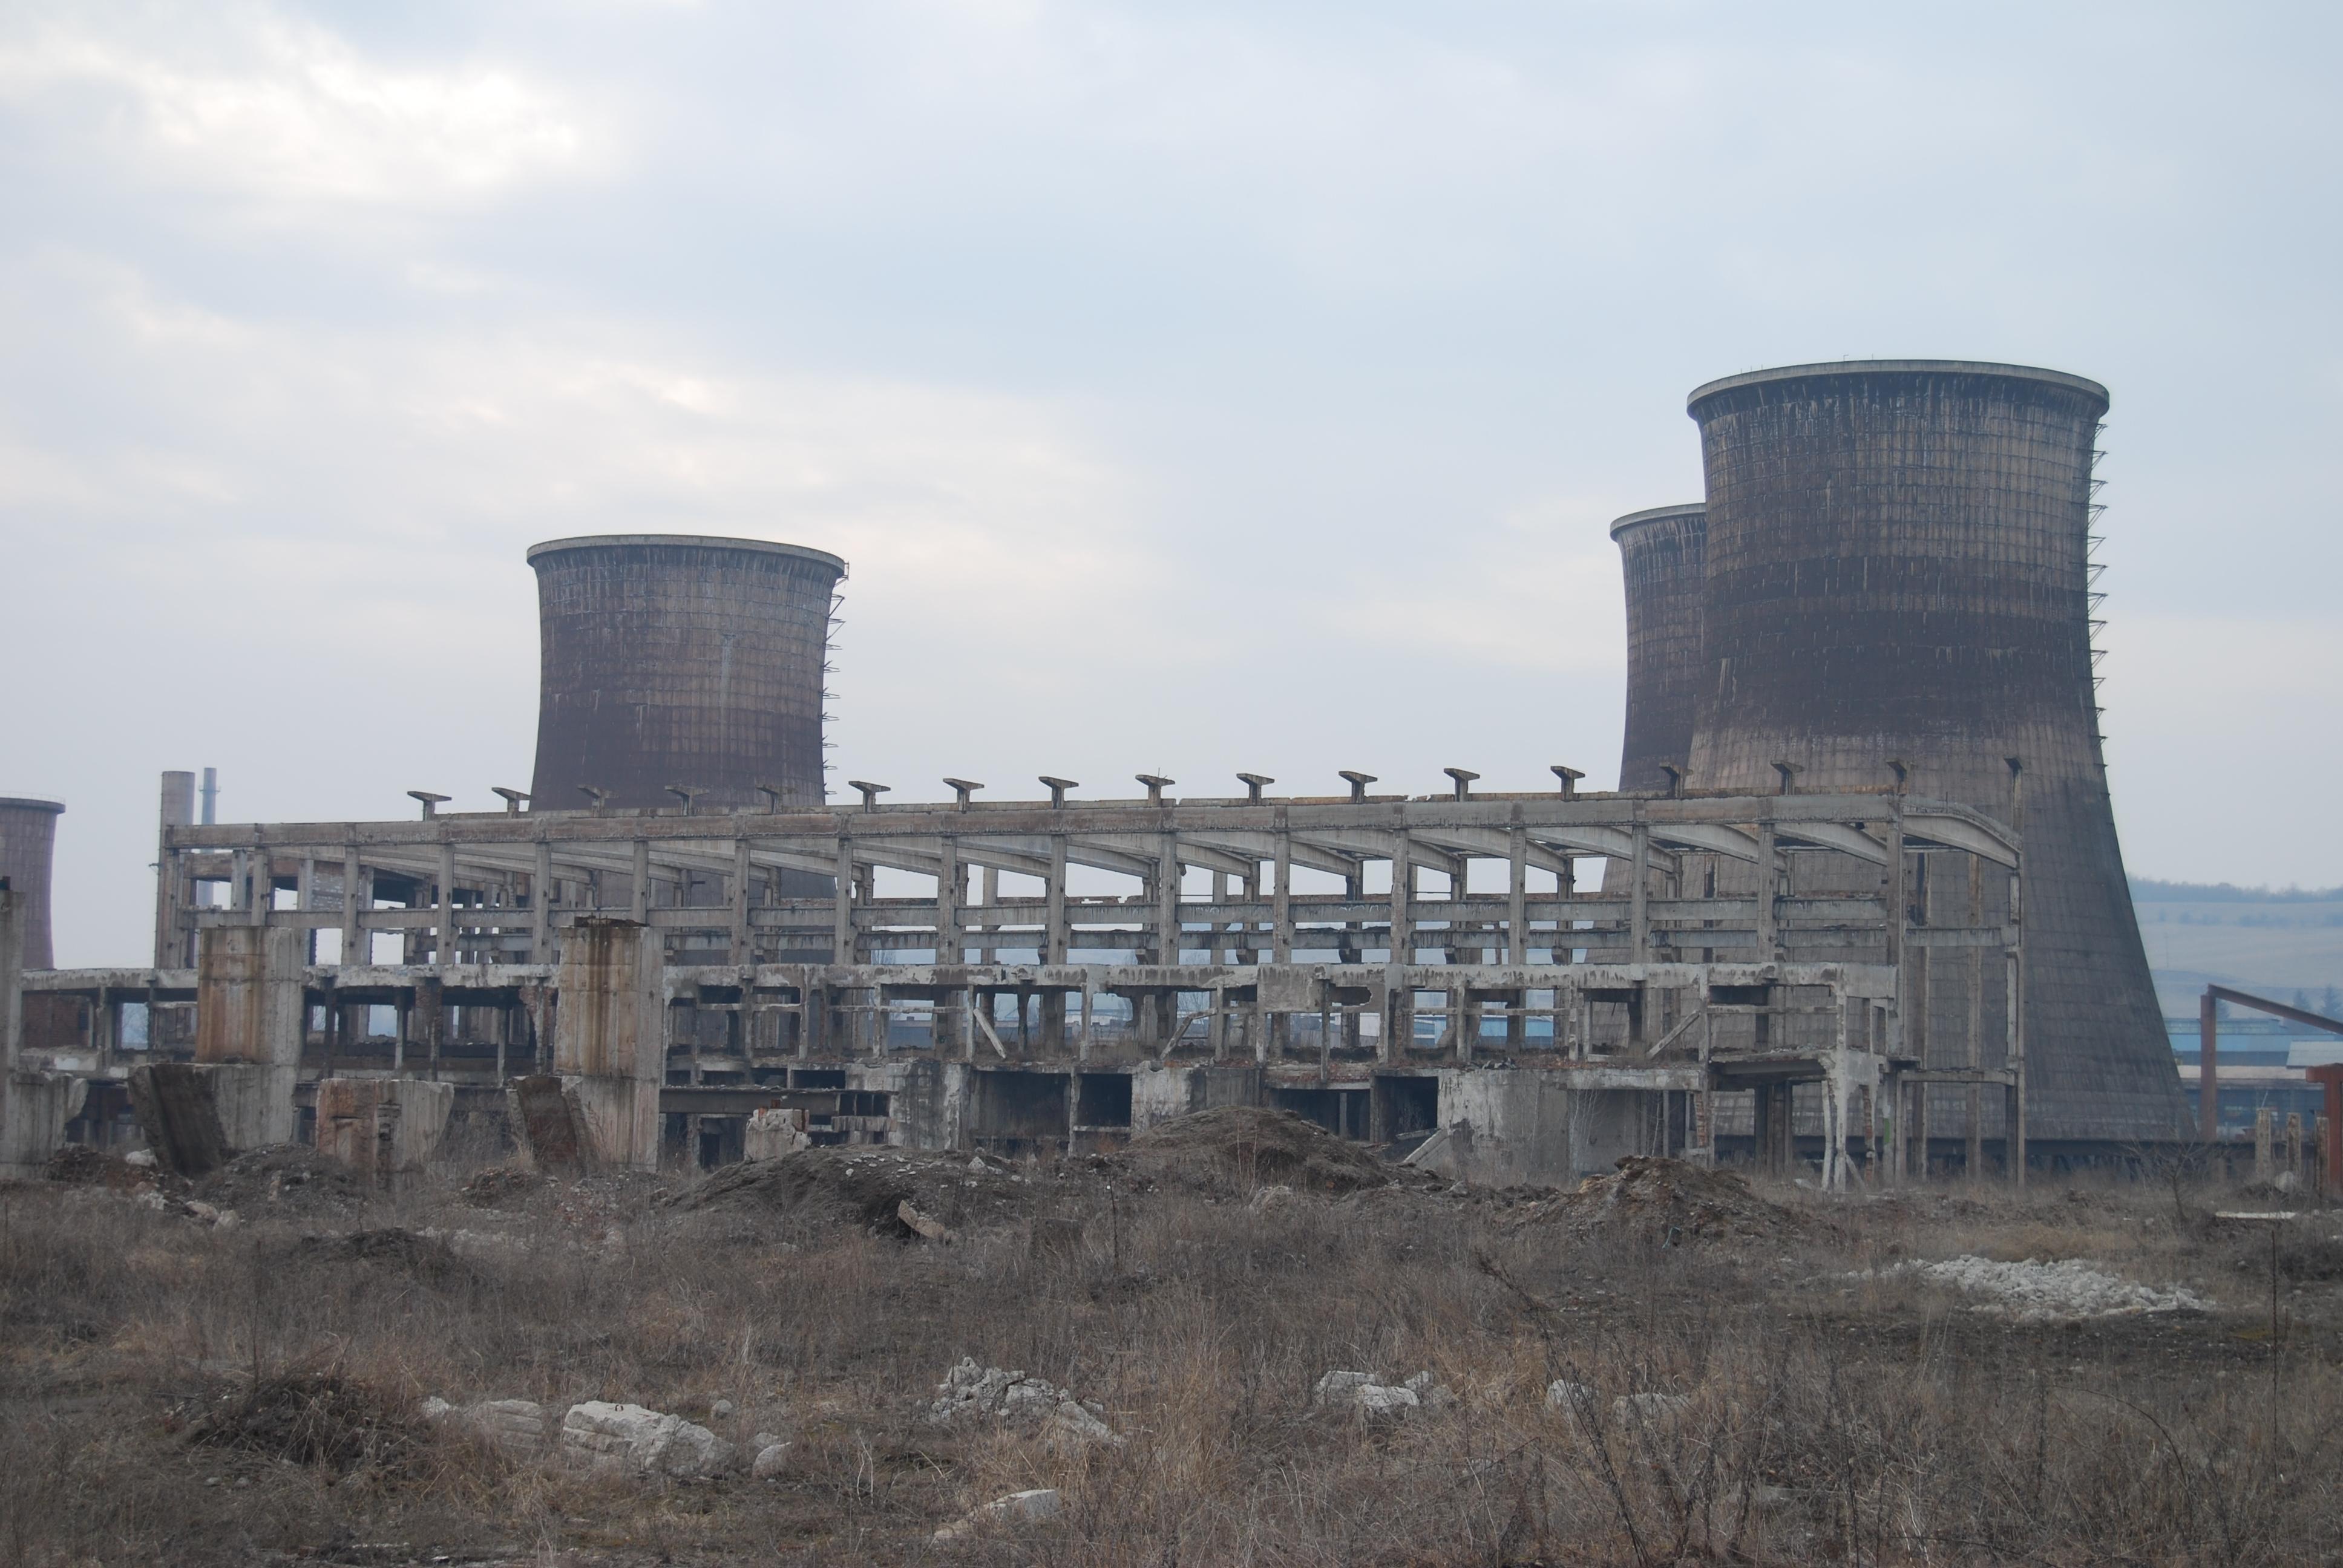 File:Calan Steel Plant in winter 2009 (3).jpg